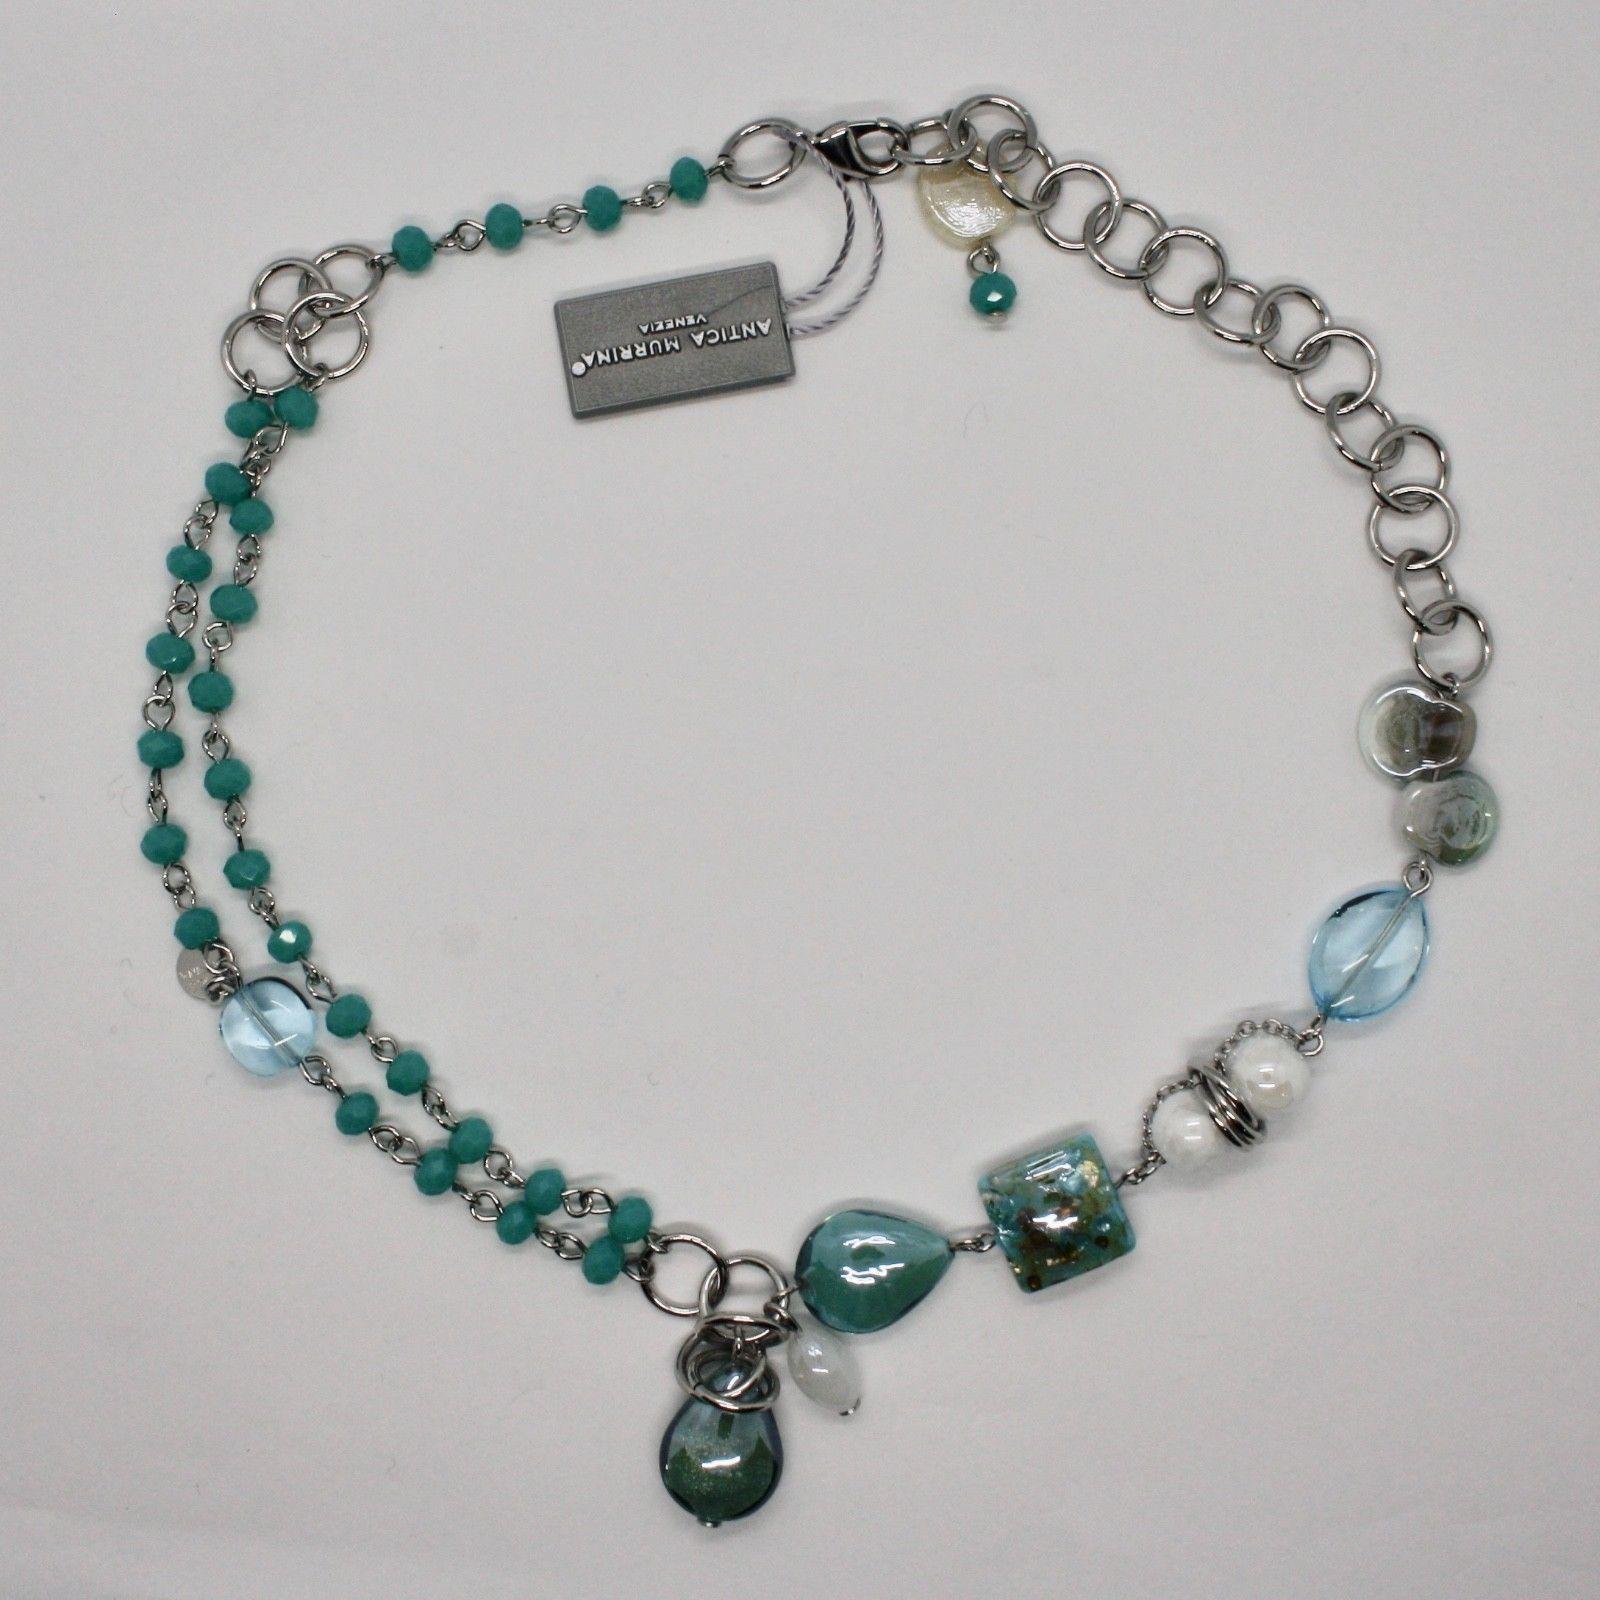 NECKLACE ANTICA MURRINA VENEZIA WITH MURANO GLASS TURQUOISE BLUE BEIGE COA80A07